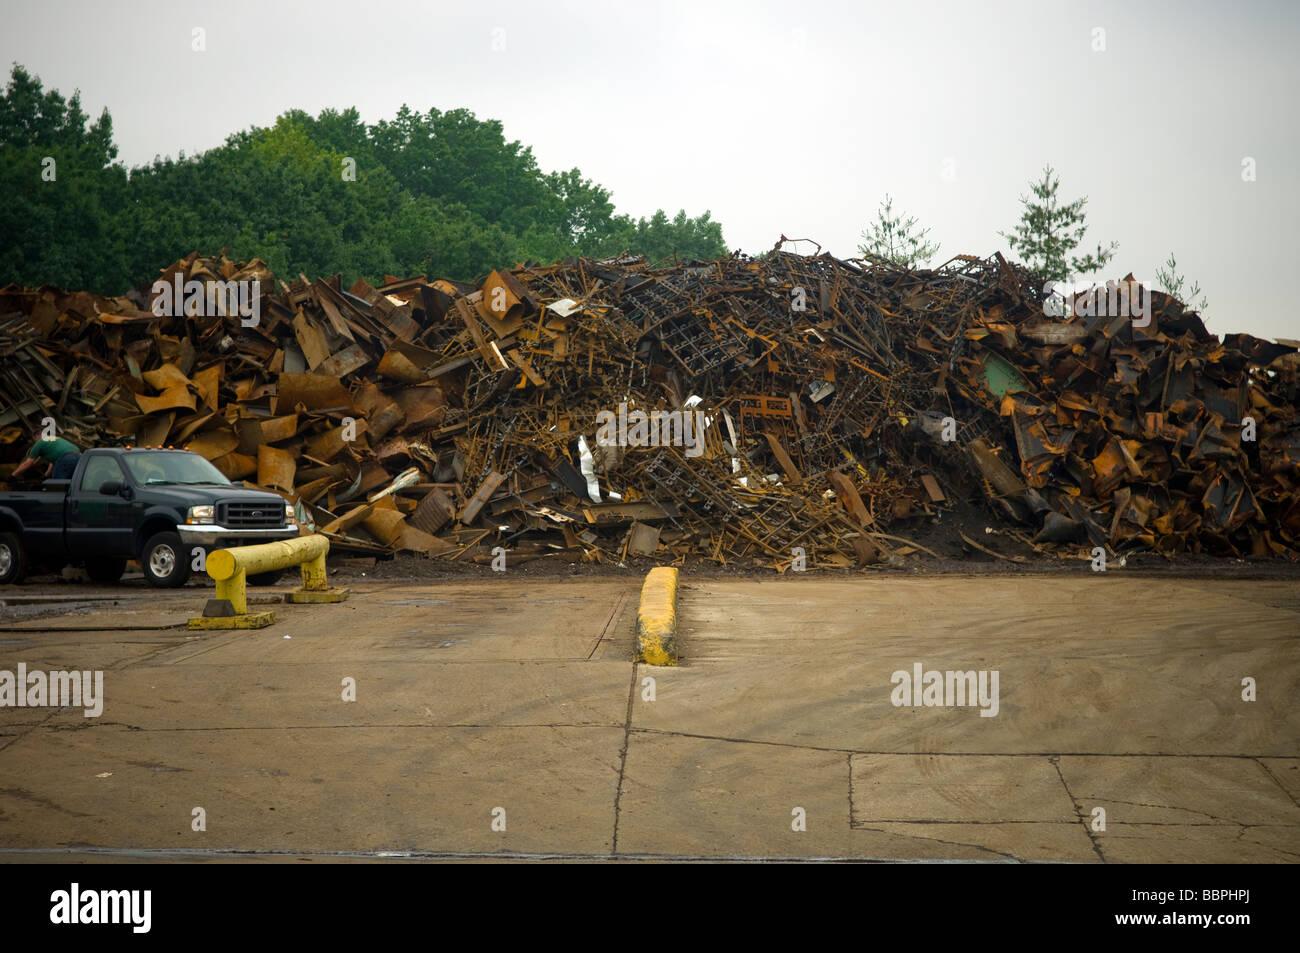 Scrap Dealer Stock Photos & Scrap Dealer Stock Images - Alamy